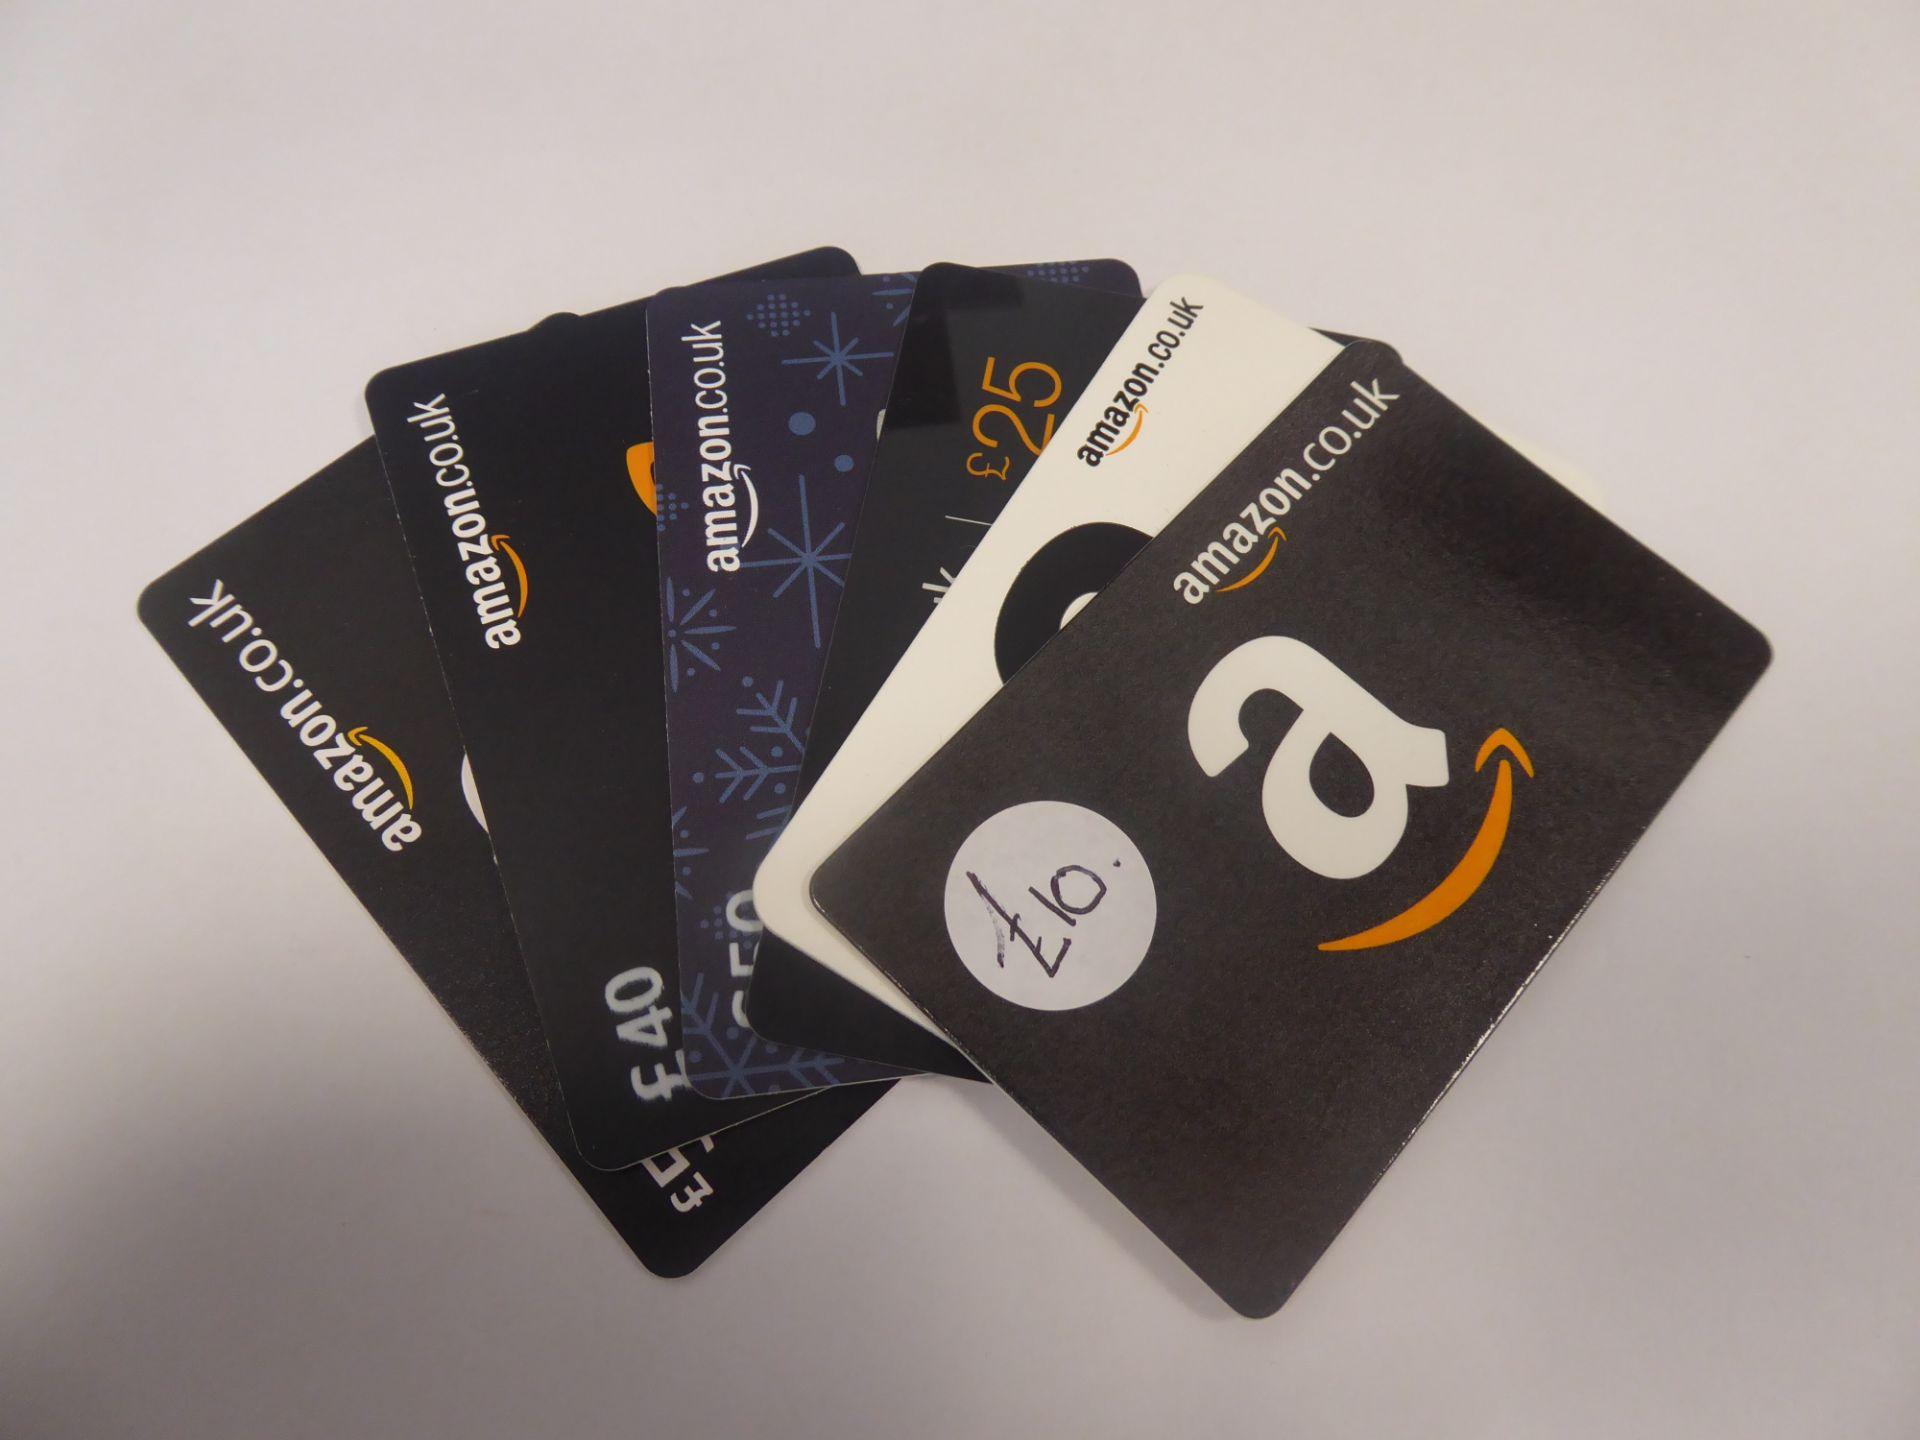 Amazon (x6) - Total face value £190